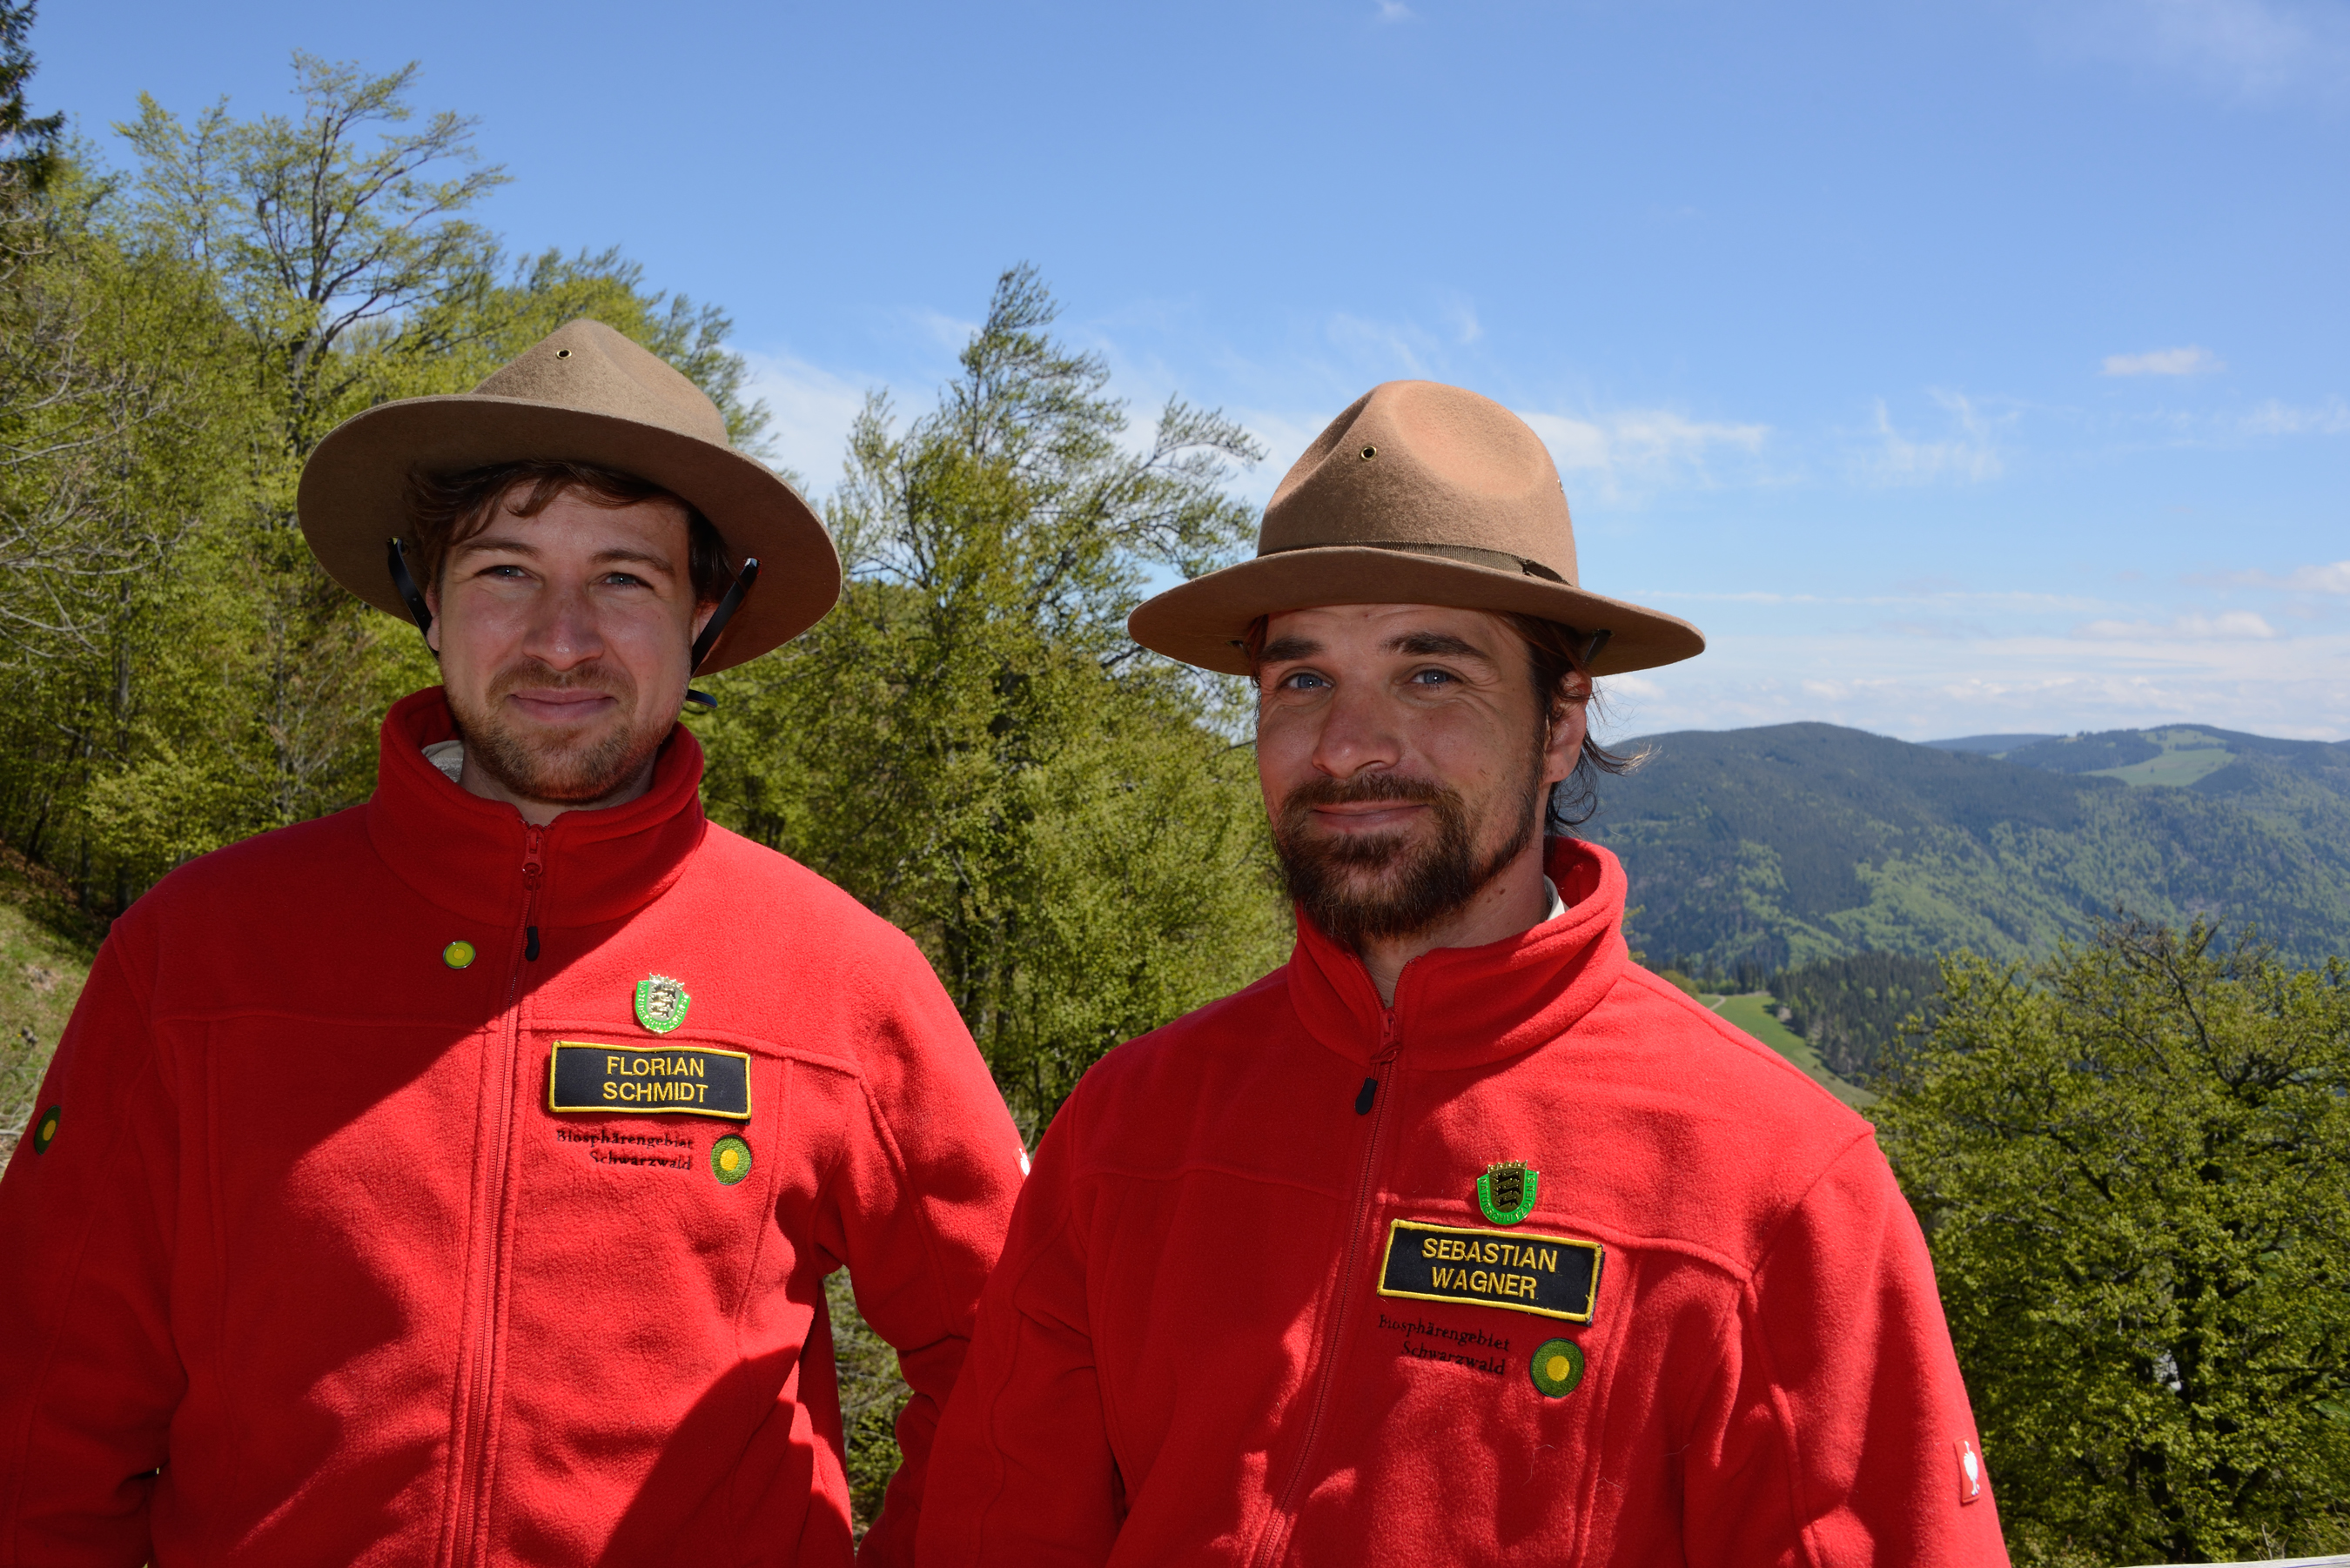 Rangertouren im Biosphärengebiet Schwarzwald: Alle Touren 2020 ausgebucht